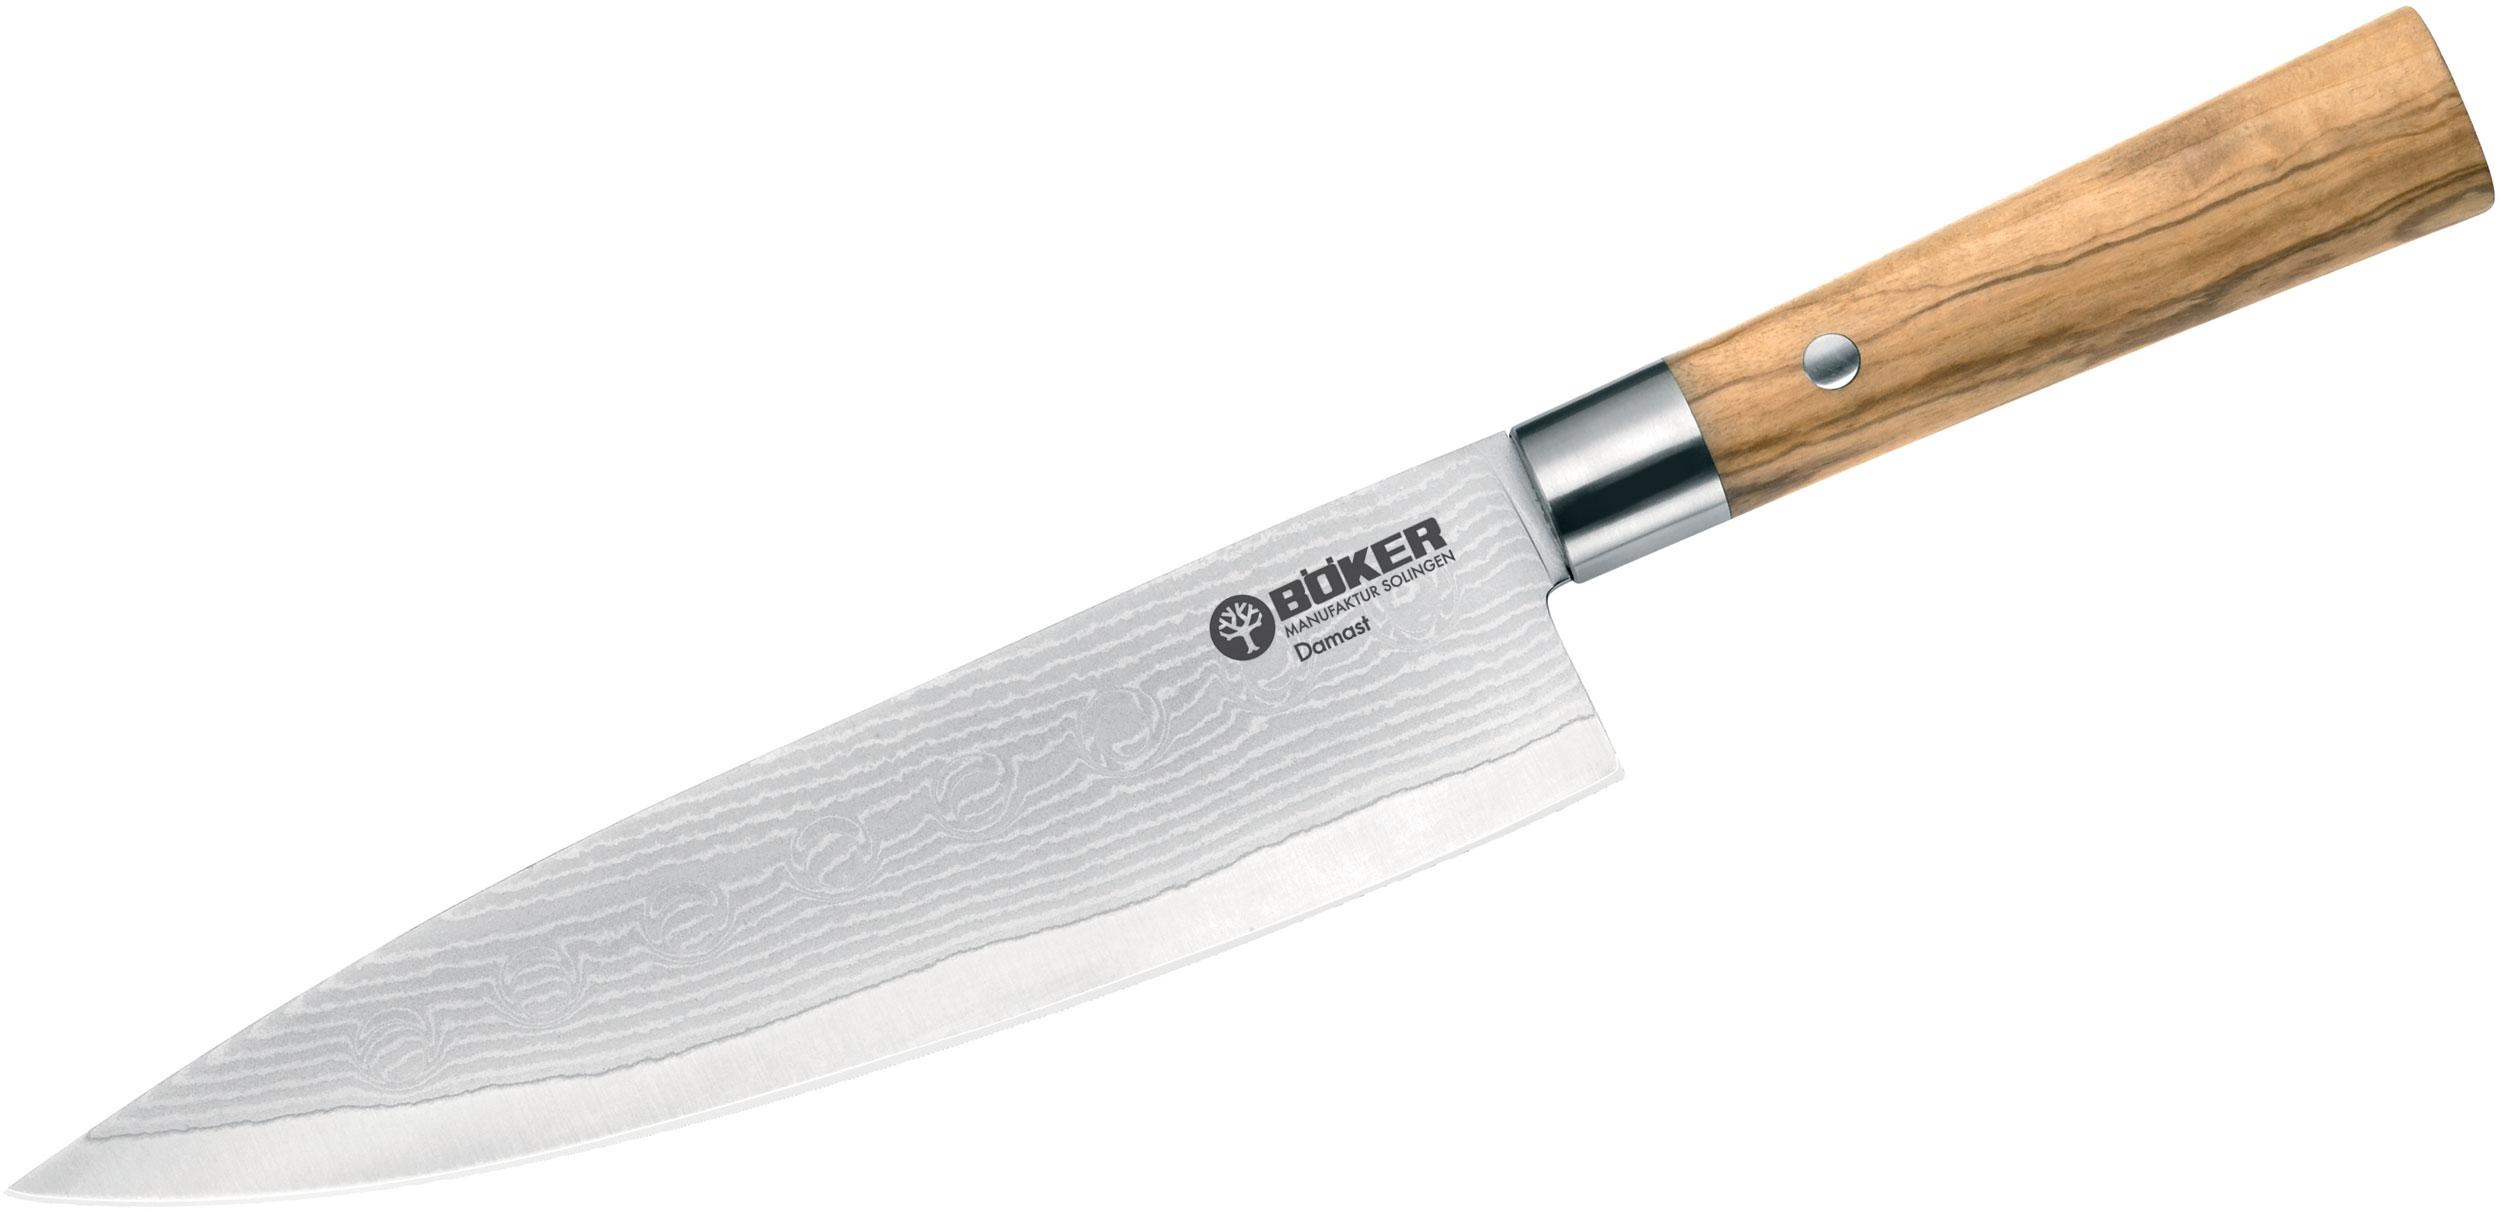 Boker Damascus Olive Chef's Knife 8.125 inch Blade, Olive Wood Handles